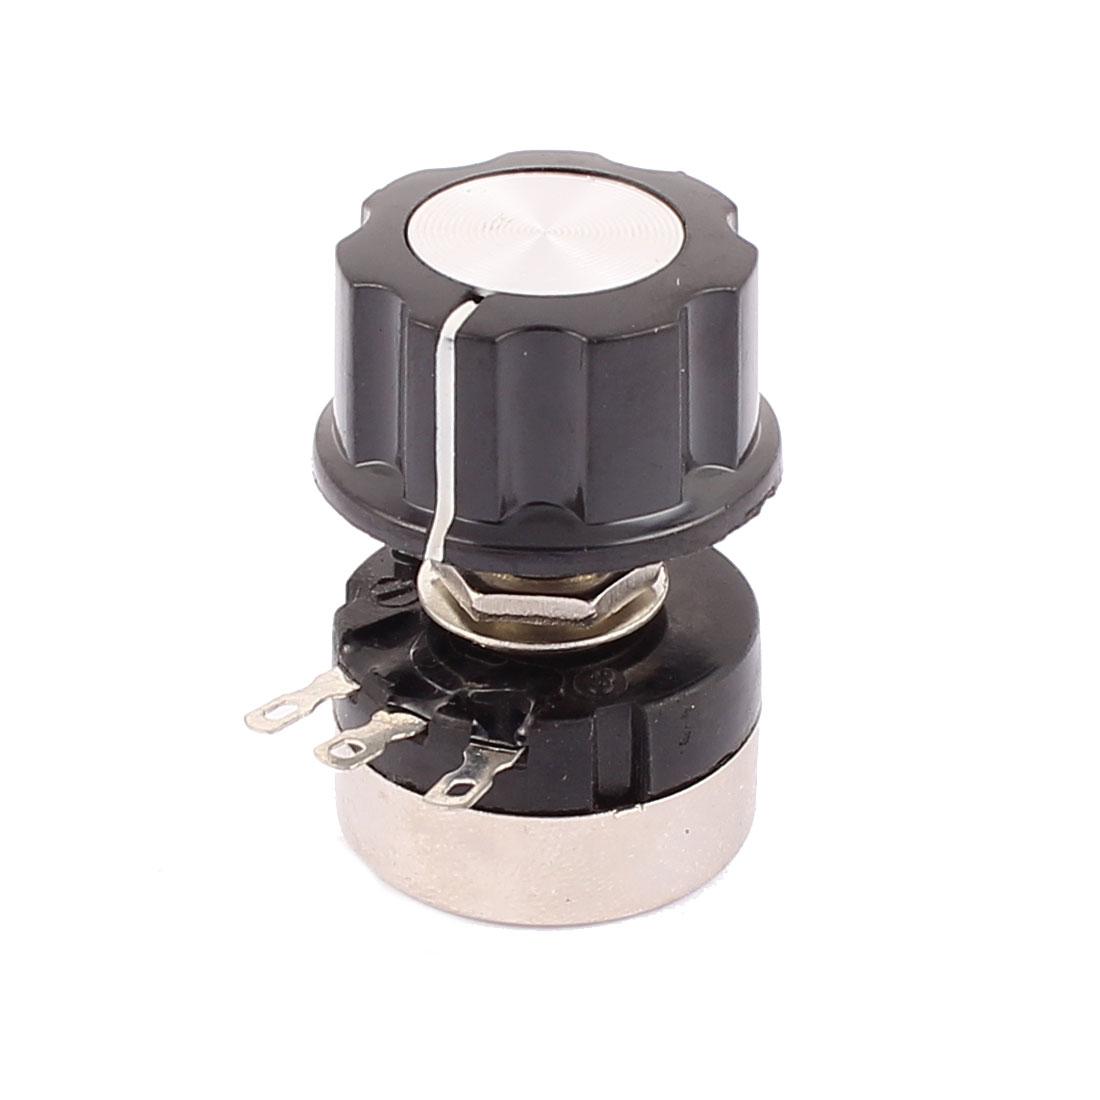 3 Terminals B104 Rotary Wirewound Potentiometer 100K Ohm Adjustable Resistance